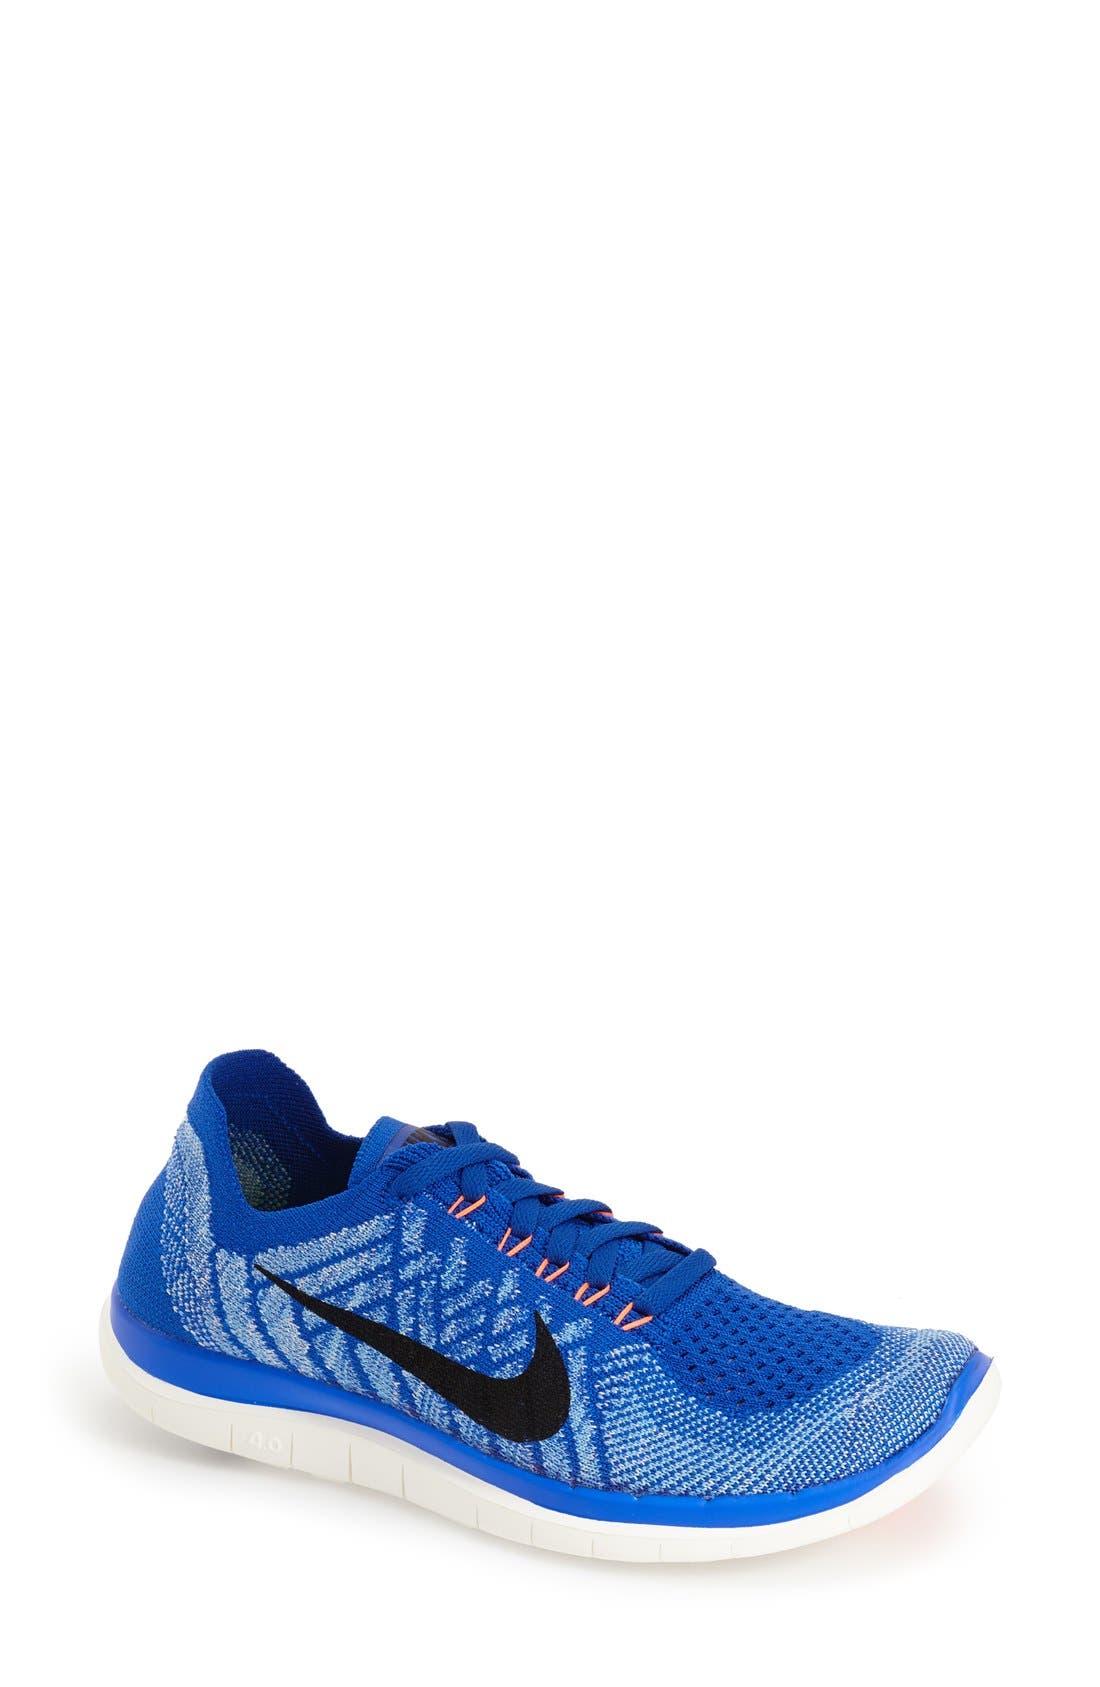 Main Image - Nike 'Free 4.0 Flyknit' Running Shoe (Women)